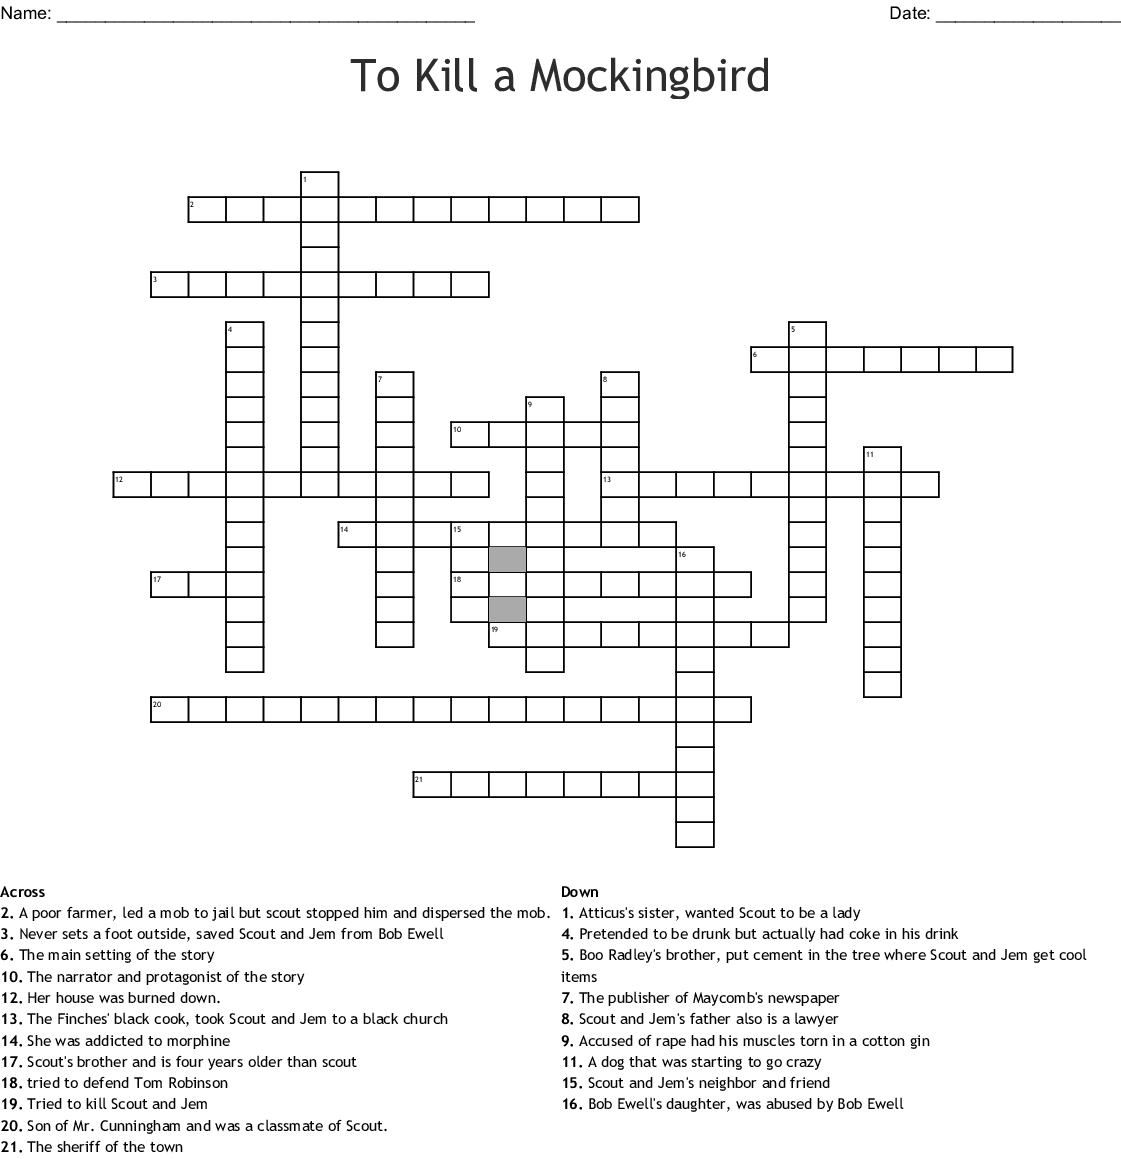 To Kill a Mockingbird: Part I Crossword - WordMint